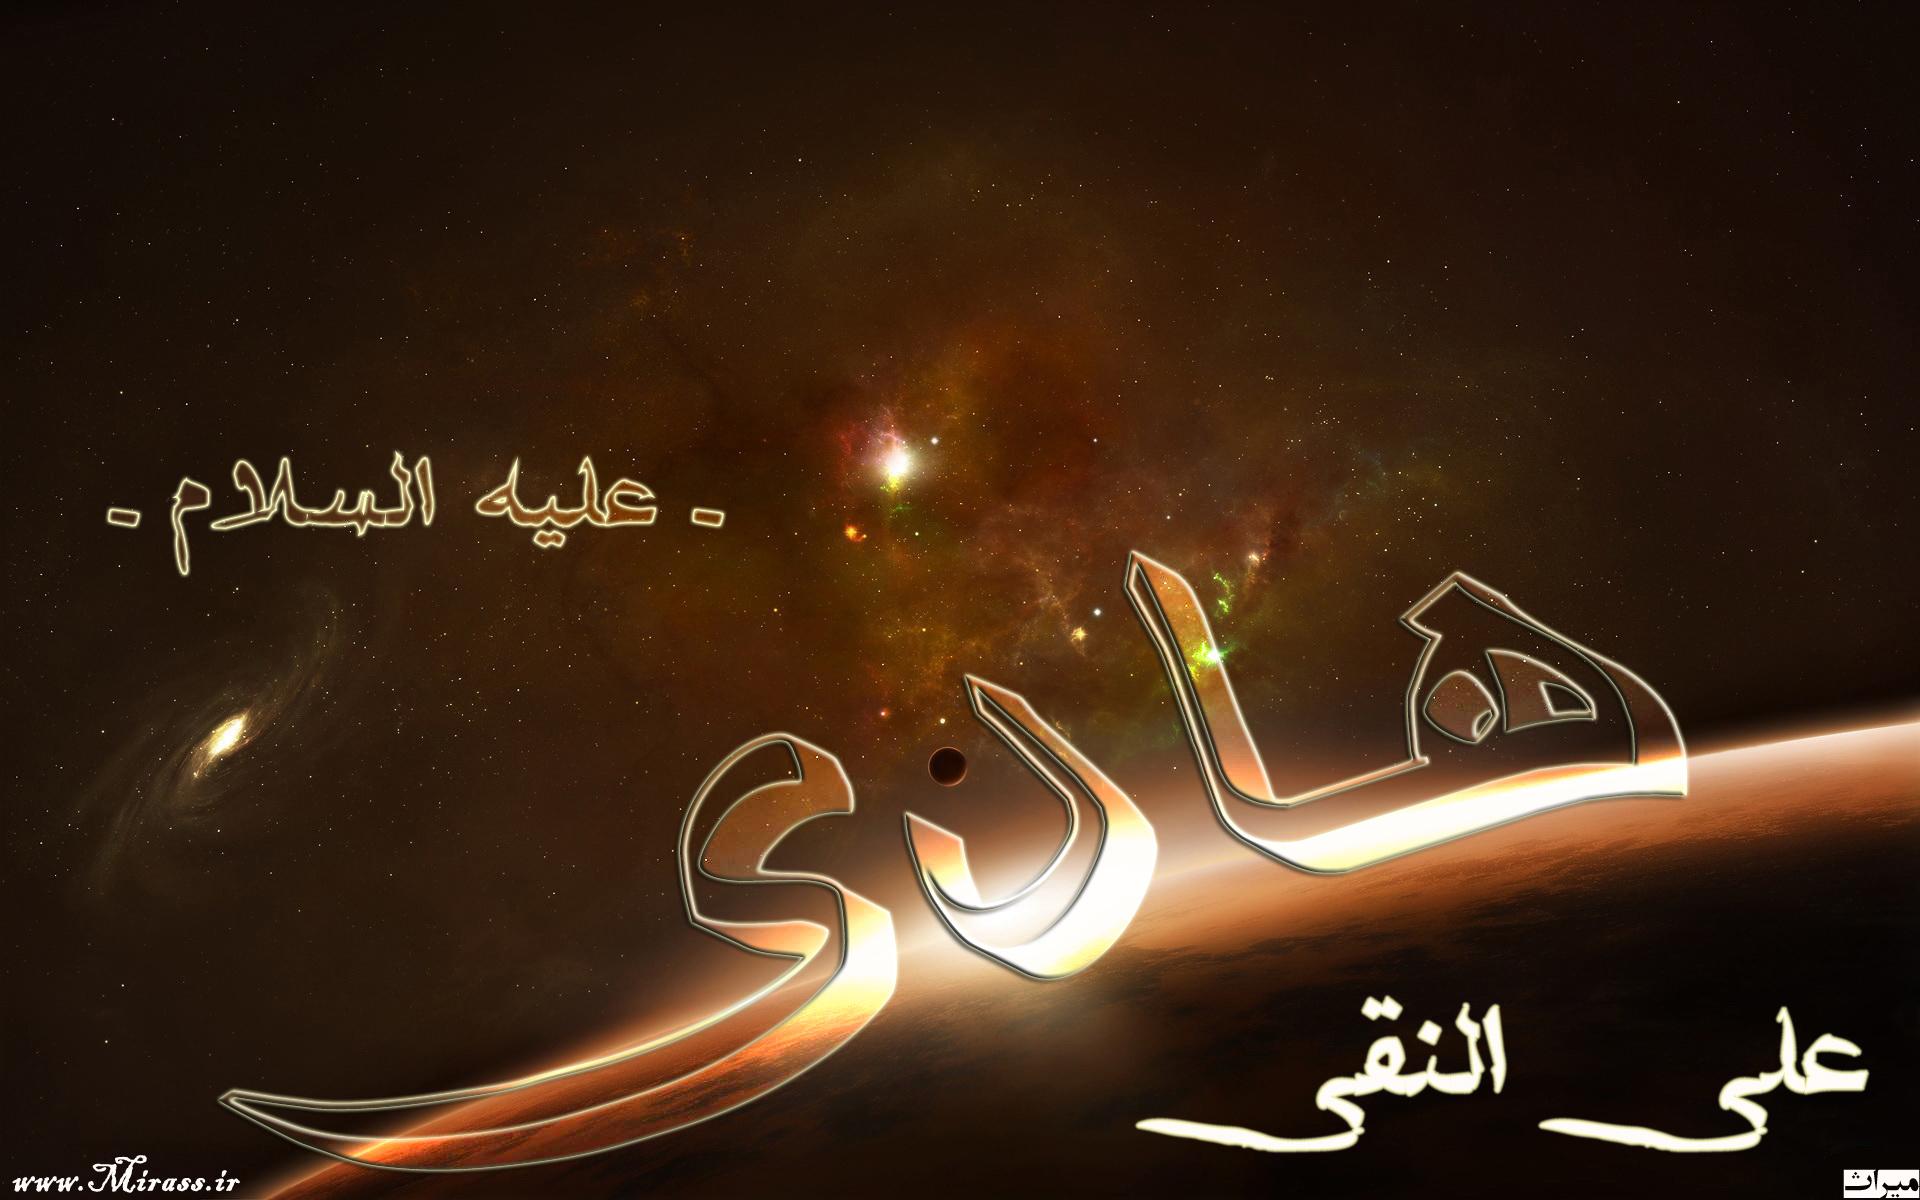 naghi,naqi,امام،هادي،نقي،عليه السلام